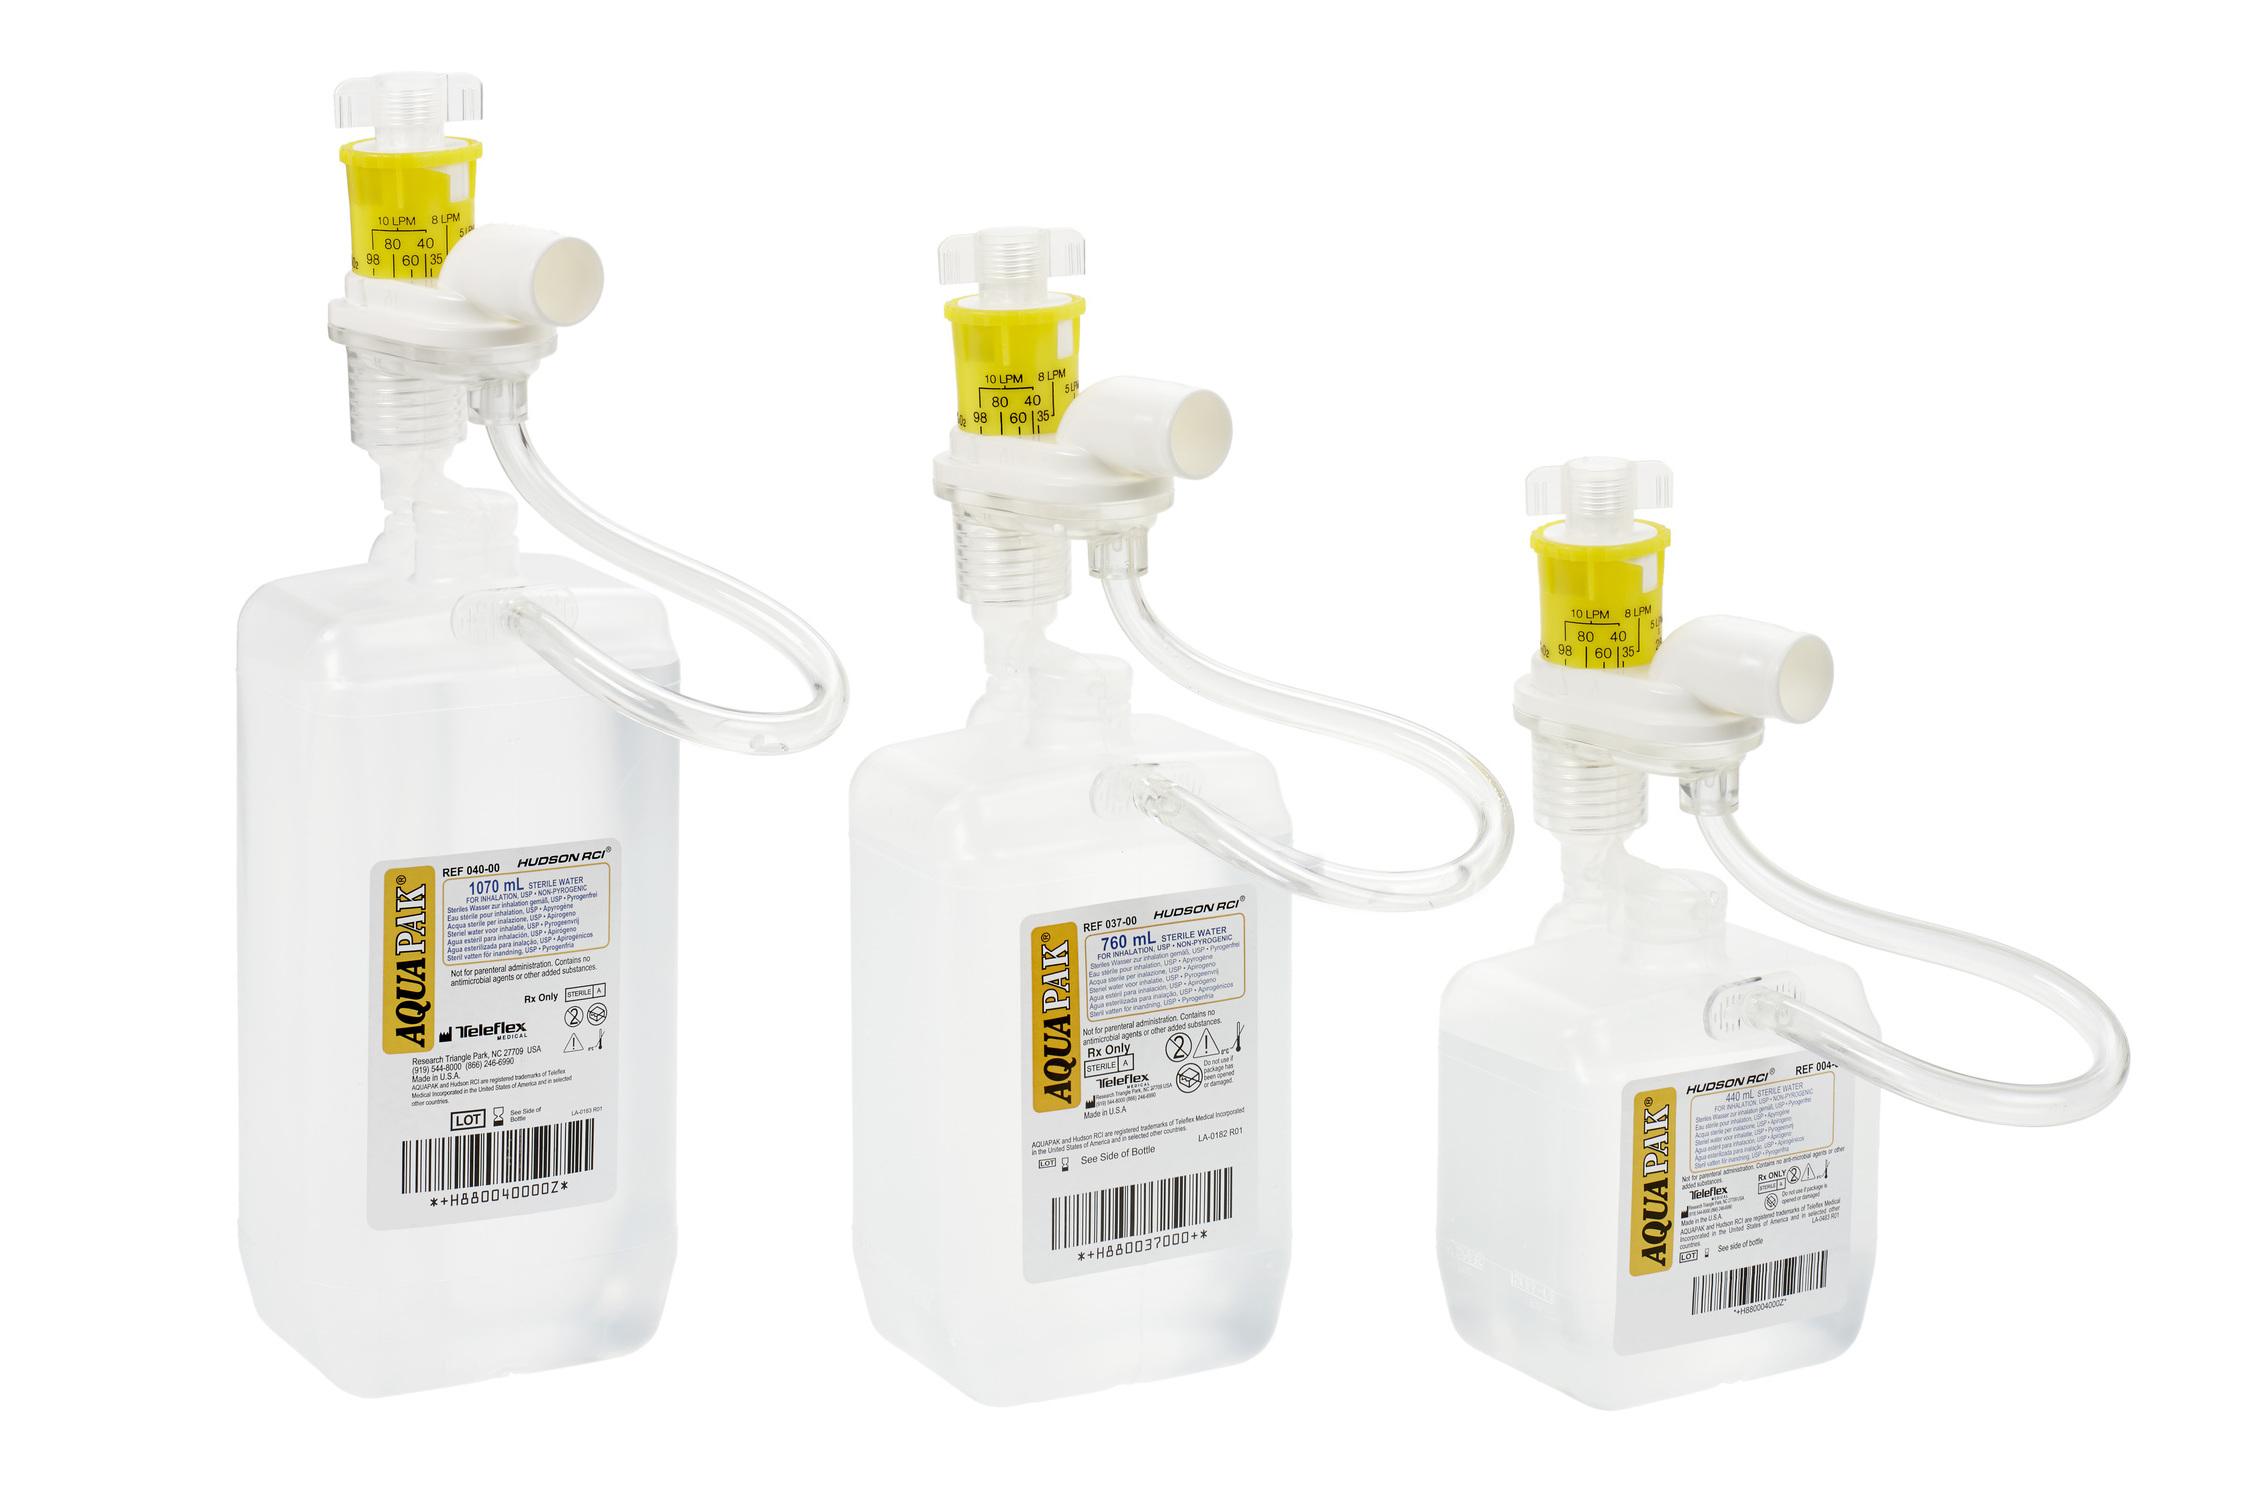 Aquapak Nebulizer Sterile Water Prefilled Nebulizer, 044-33, 440 mL - 1 Each